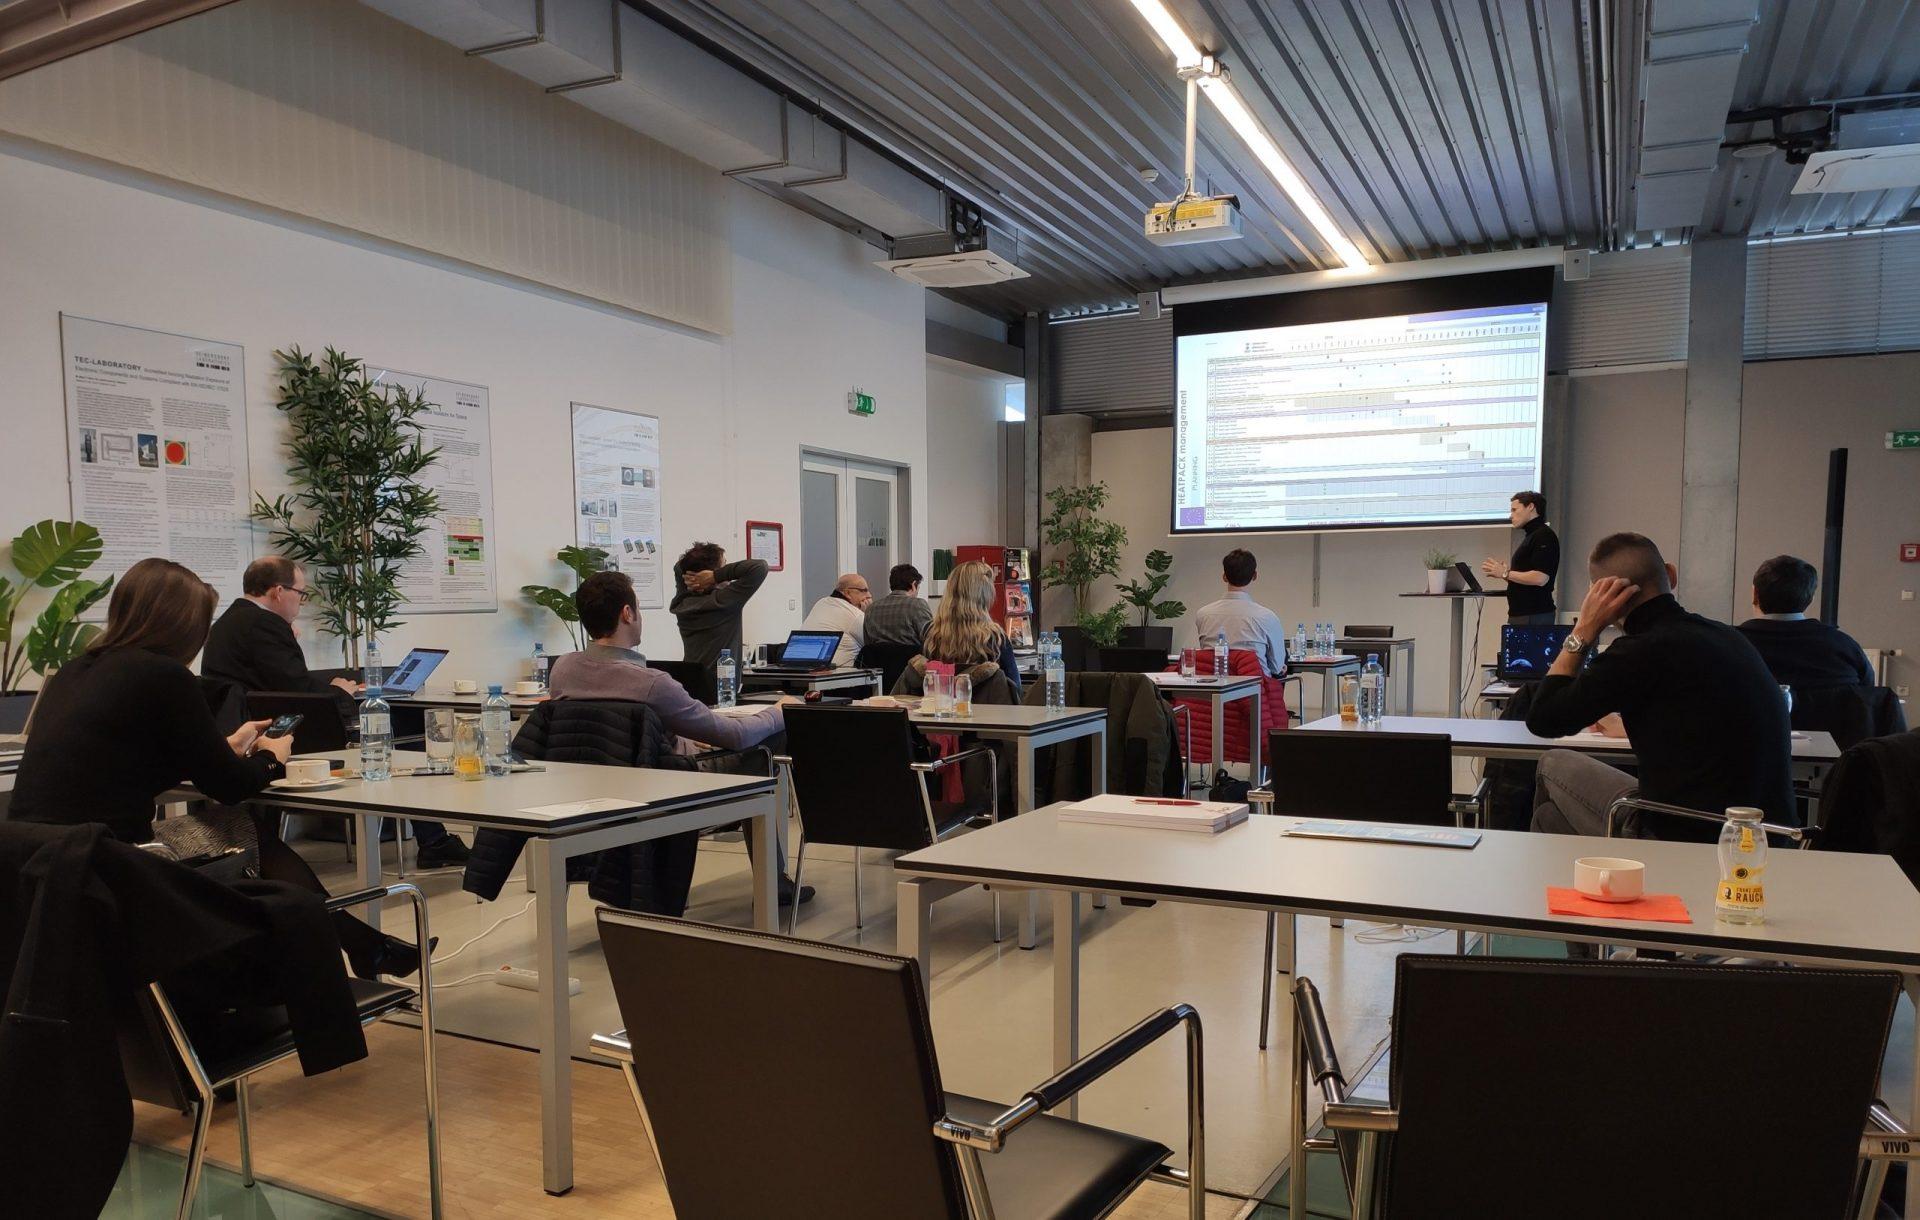 First Year Review Meeting of HEATPACK held at Seibersdorf